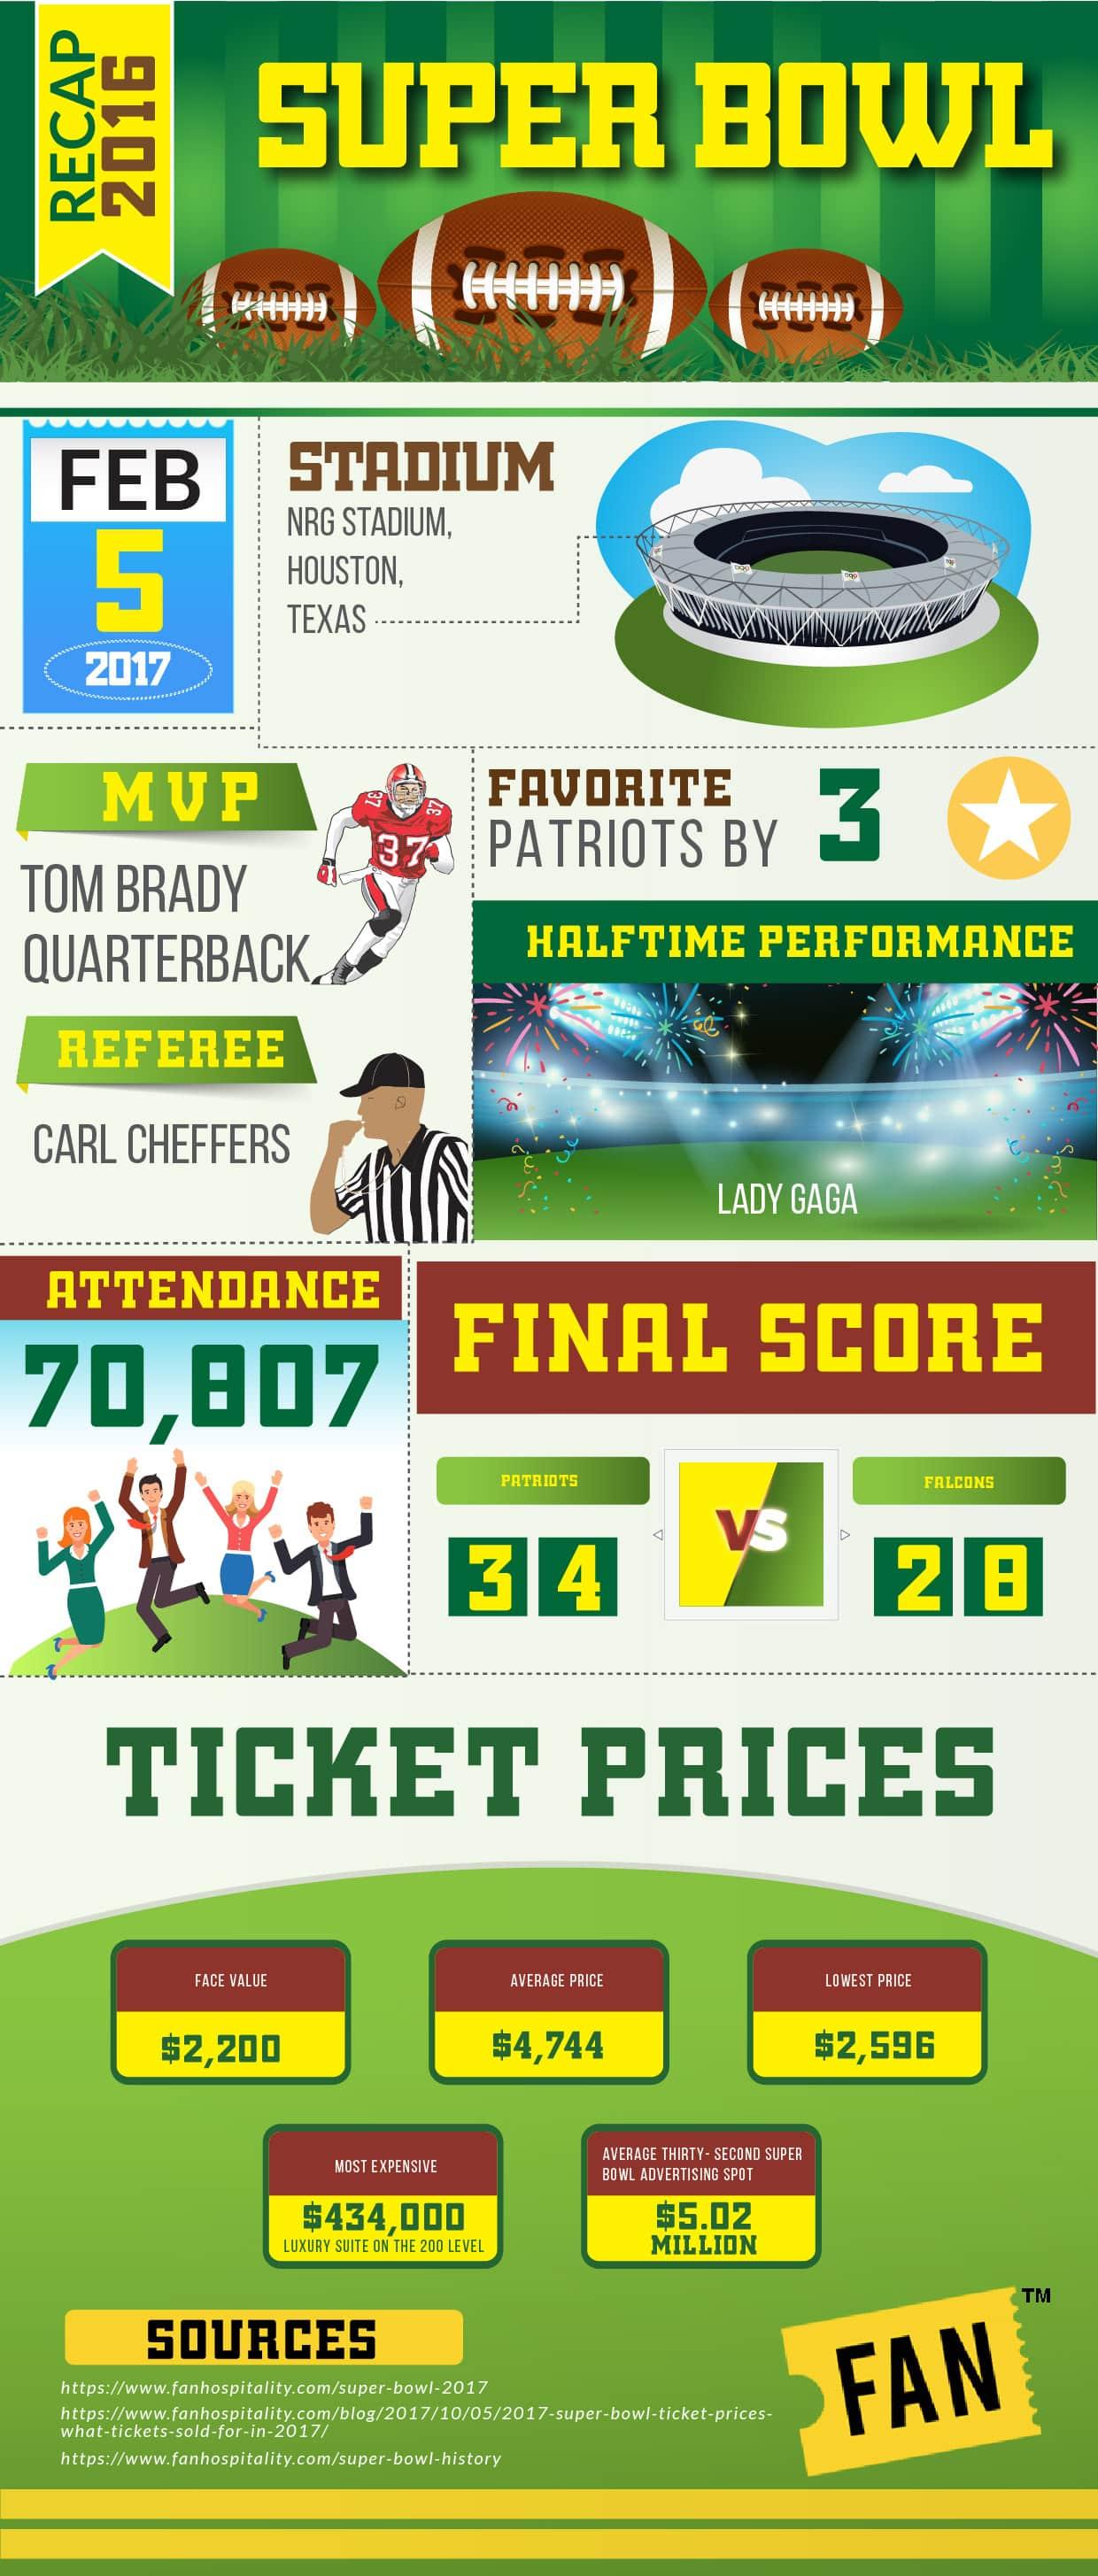 Super Bowl 2017 Tickets Houston Texas Fan Hospitality